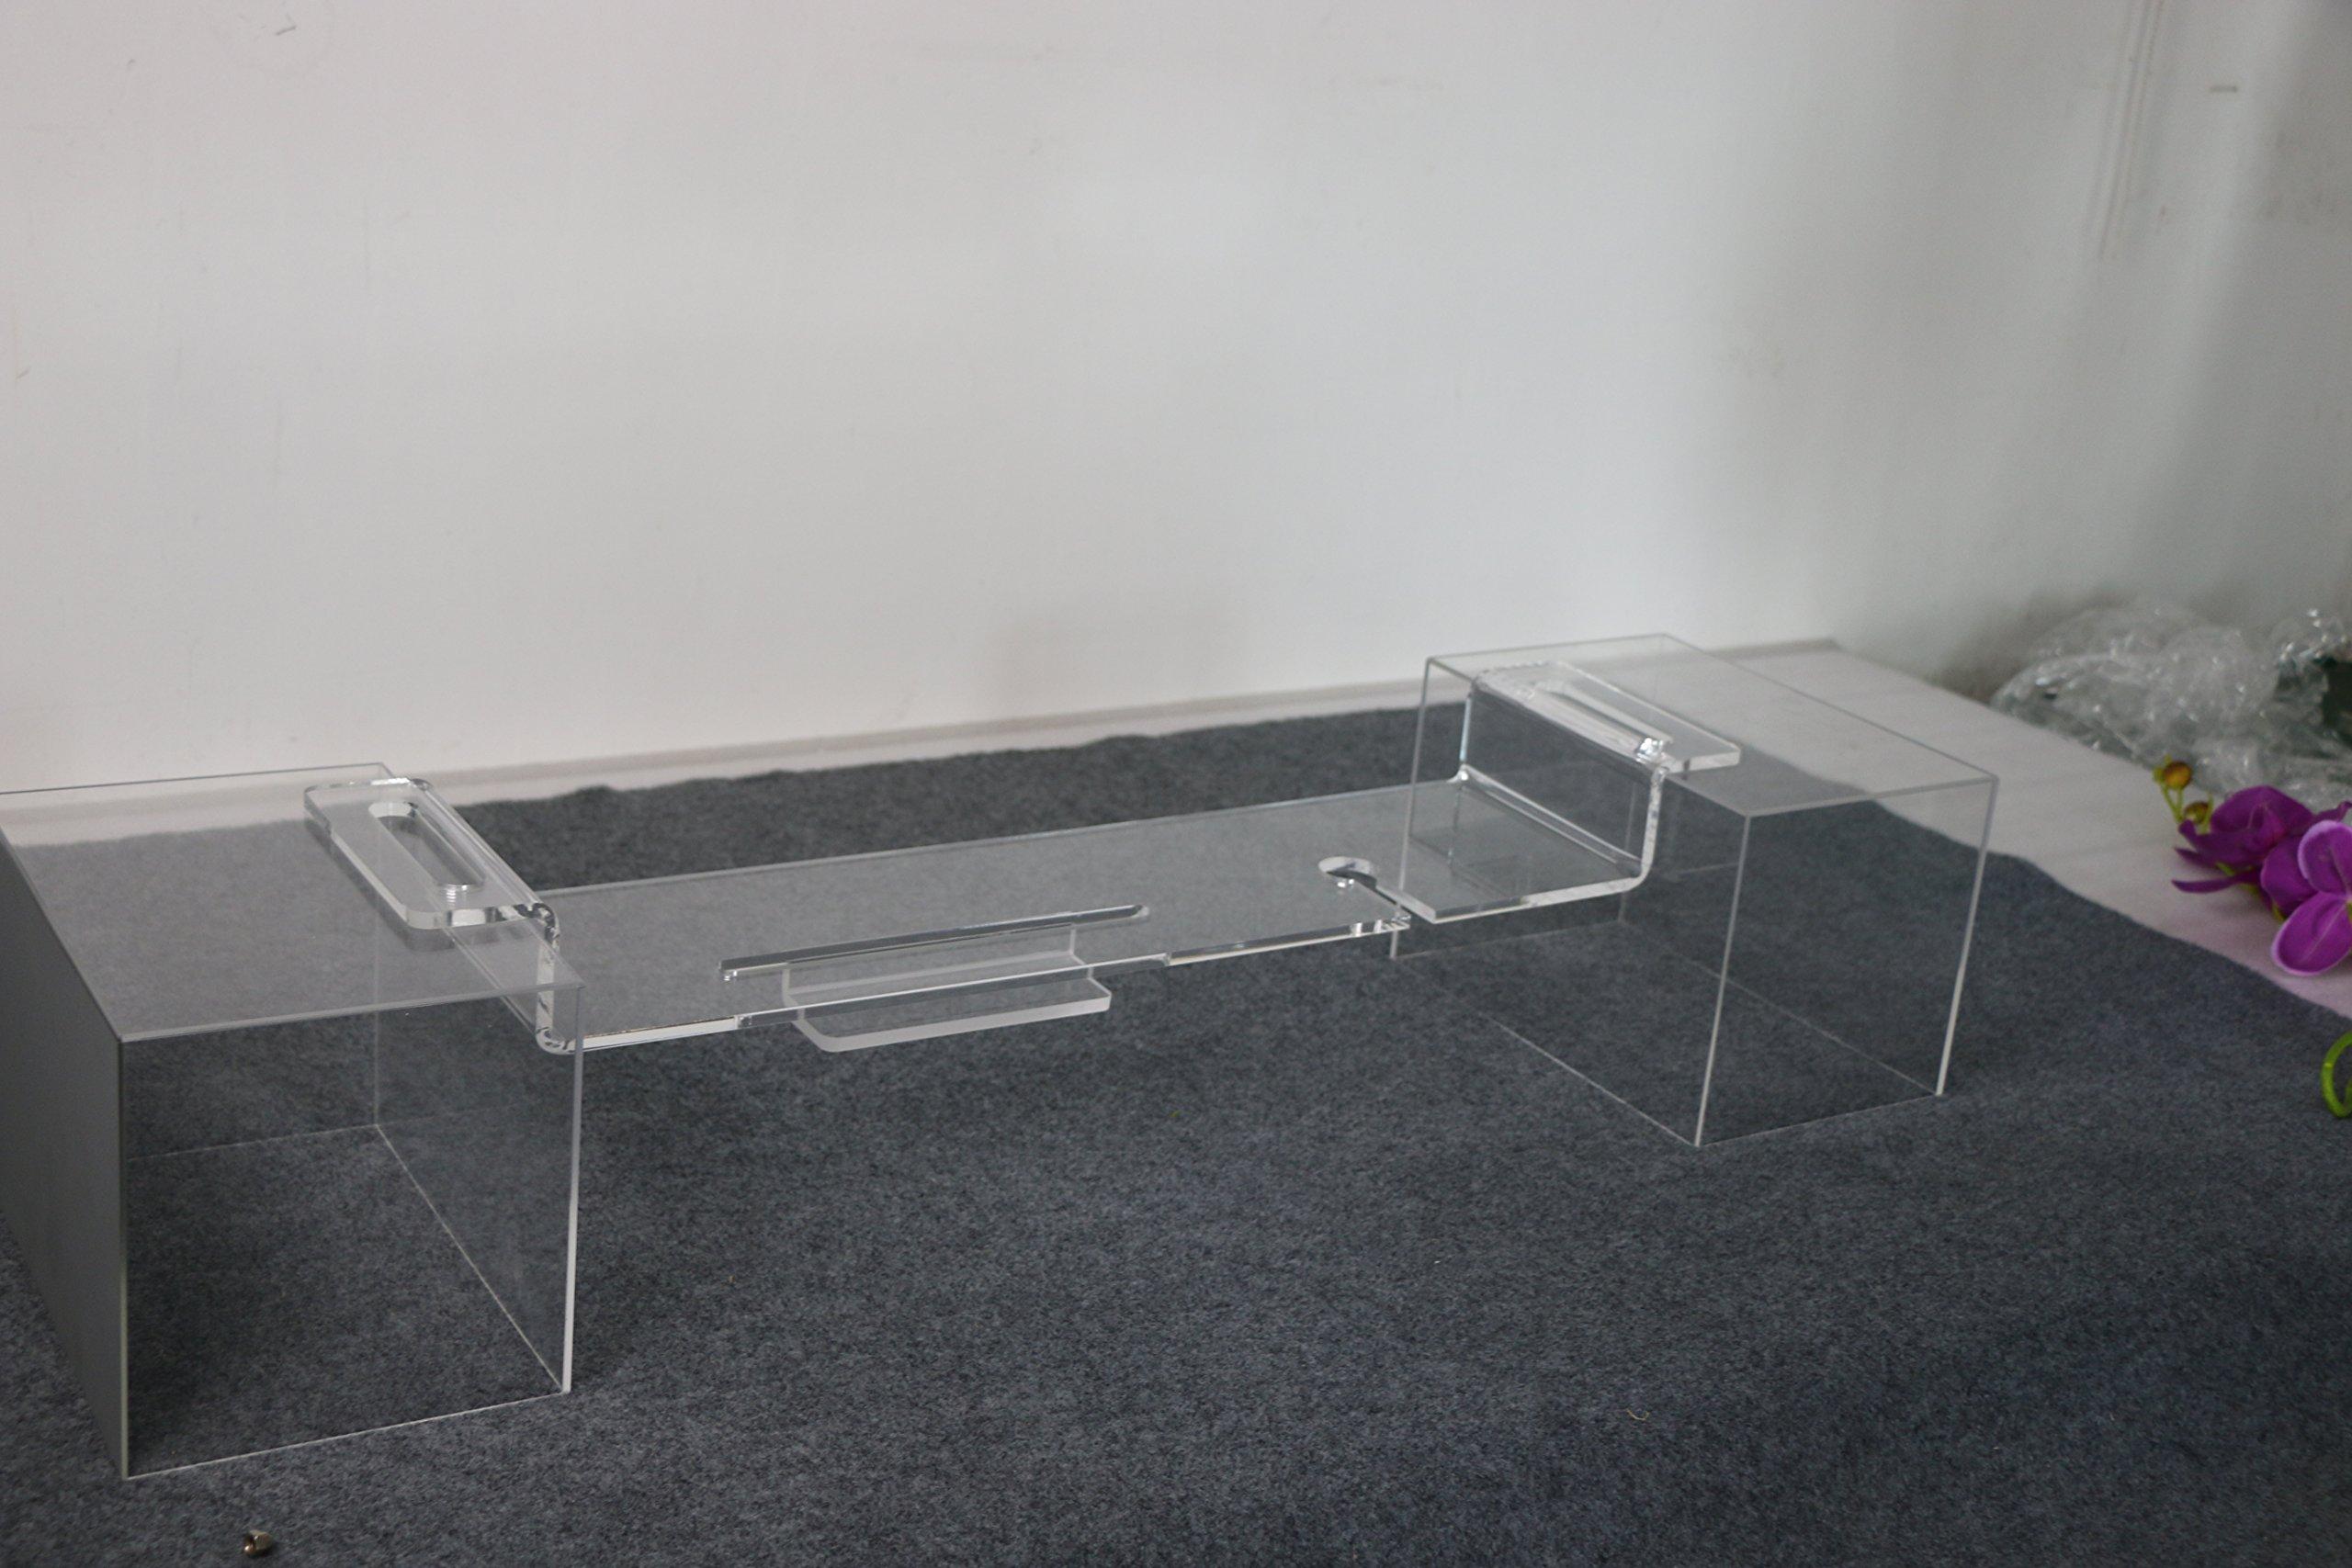 ONELUX Acrylic Bathtub mobilephone/pad Storage Shelf Rack,Lucite Bathroom Wine Glass Holder Tray -(74W18D, Clear)